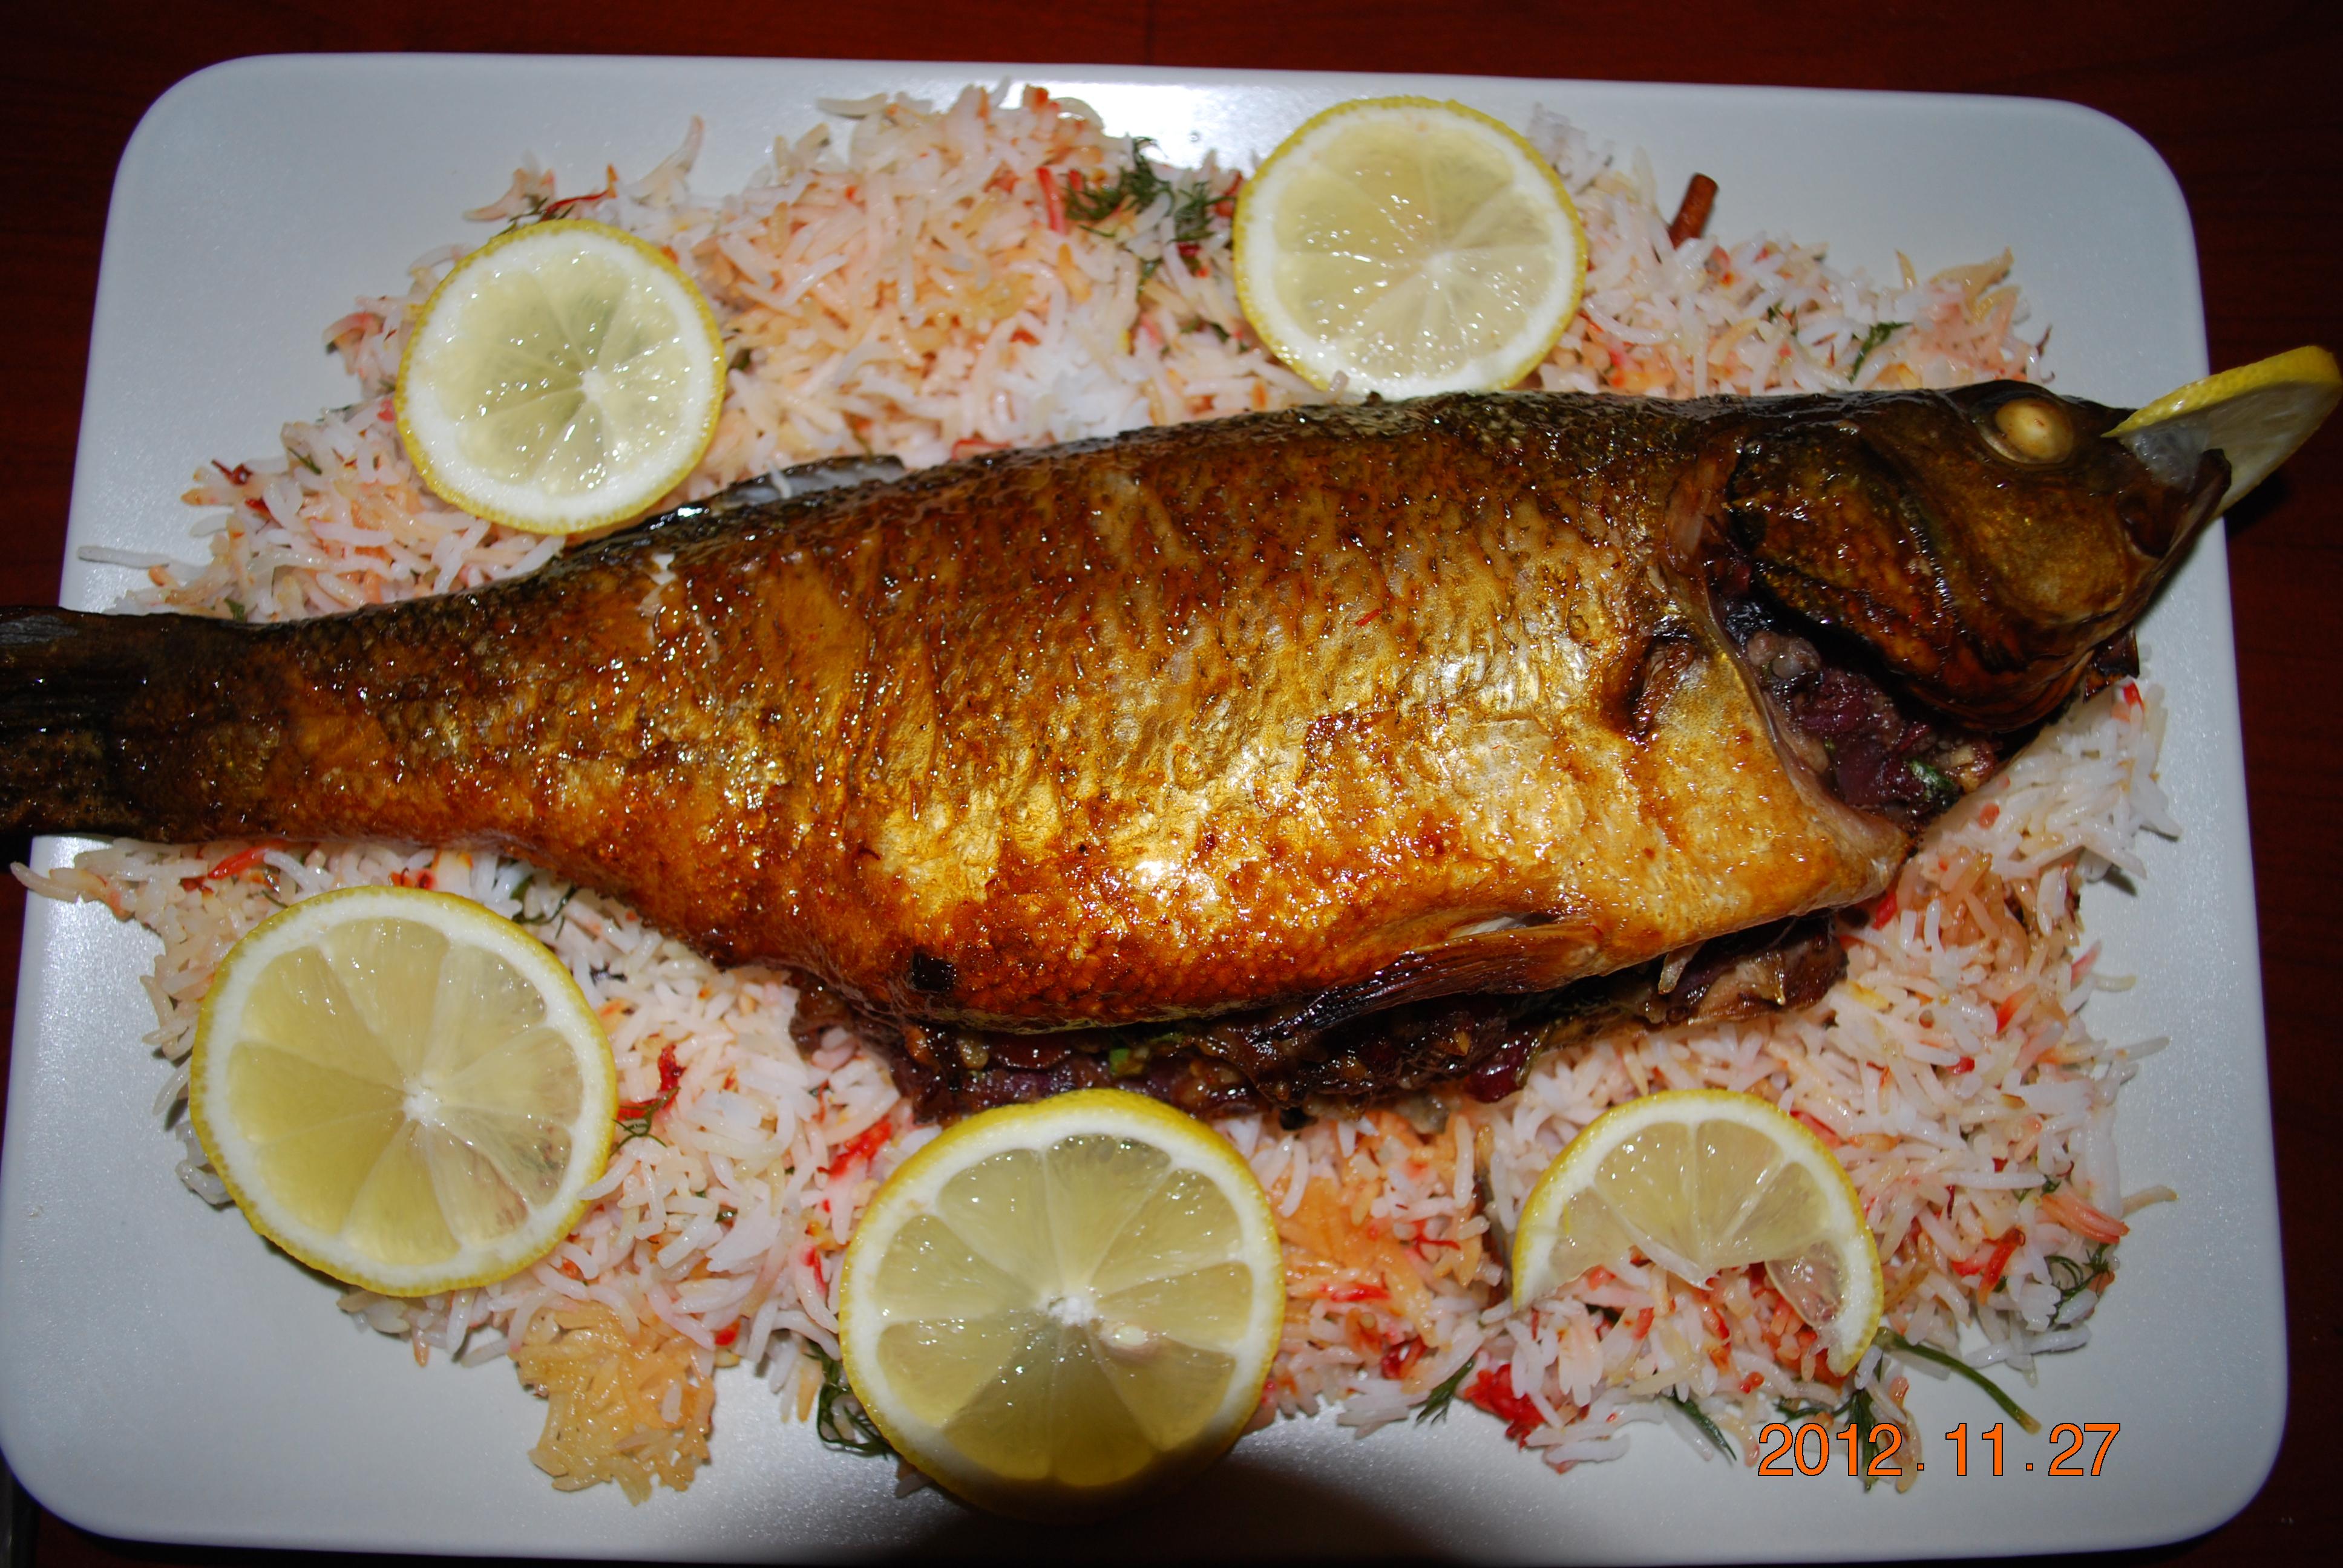 An indian cooking azeri food in london foodprints for Azerbaijan cuisine